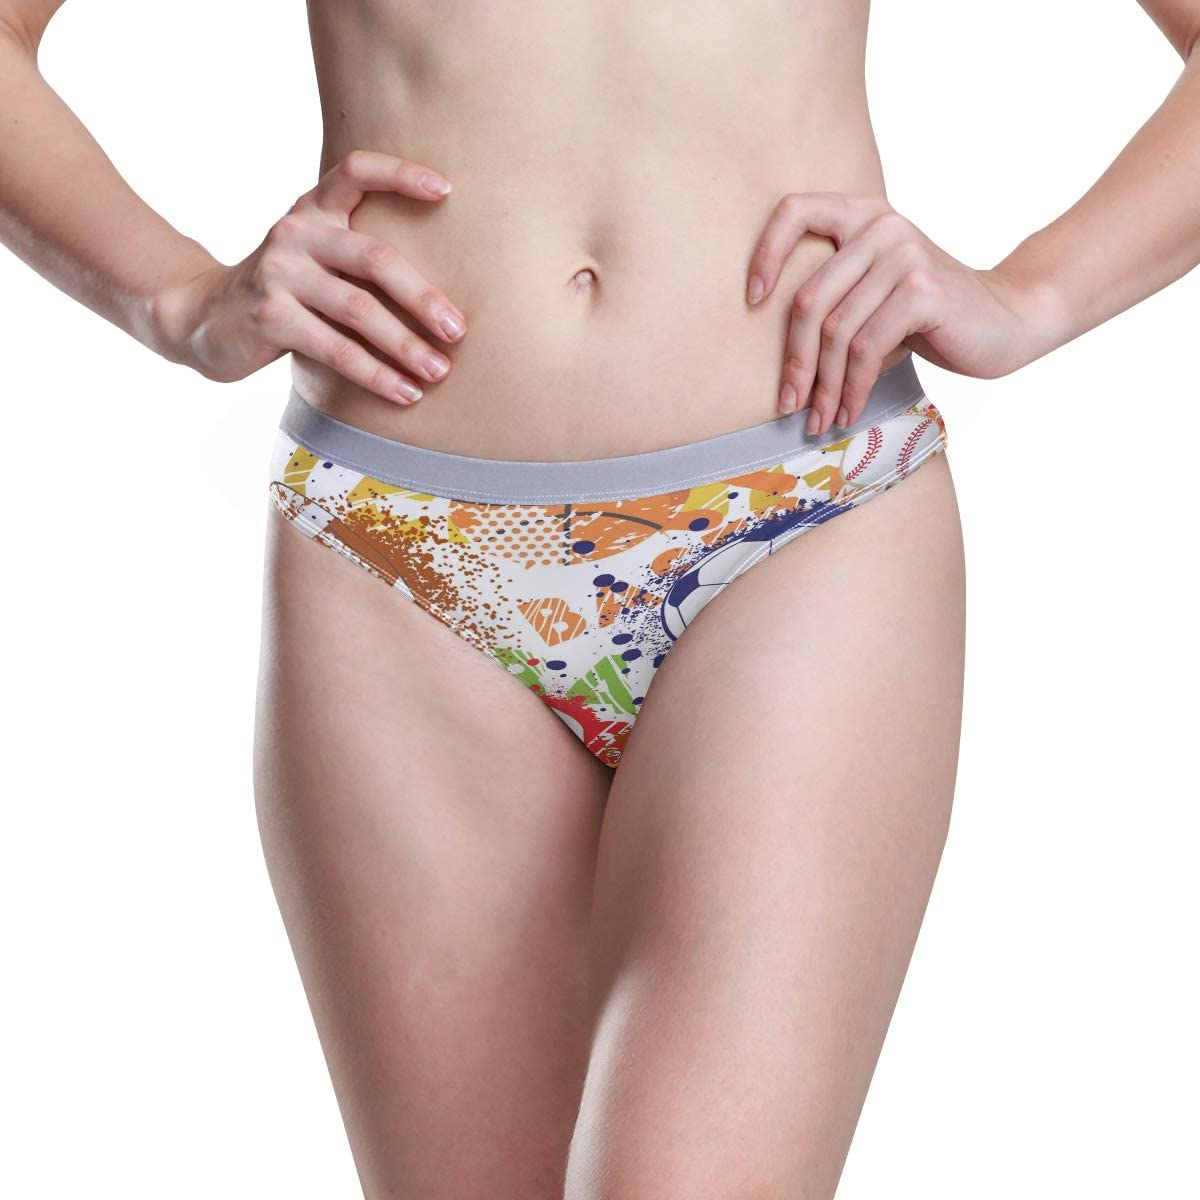 Womens Underwear Cheeky Panties Colorful Sport Ball American Football Basebal Volleyball Ladies High Cut Bikini Sexy Panty